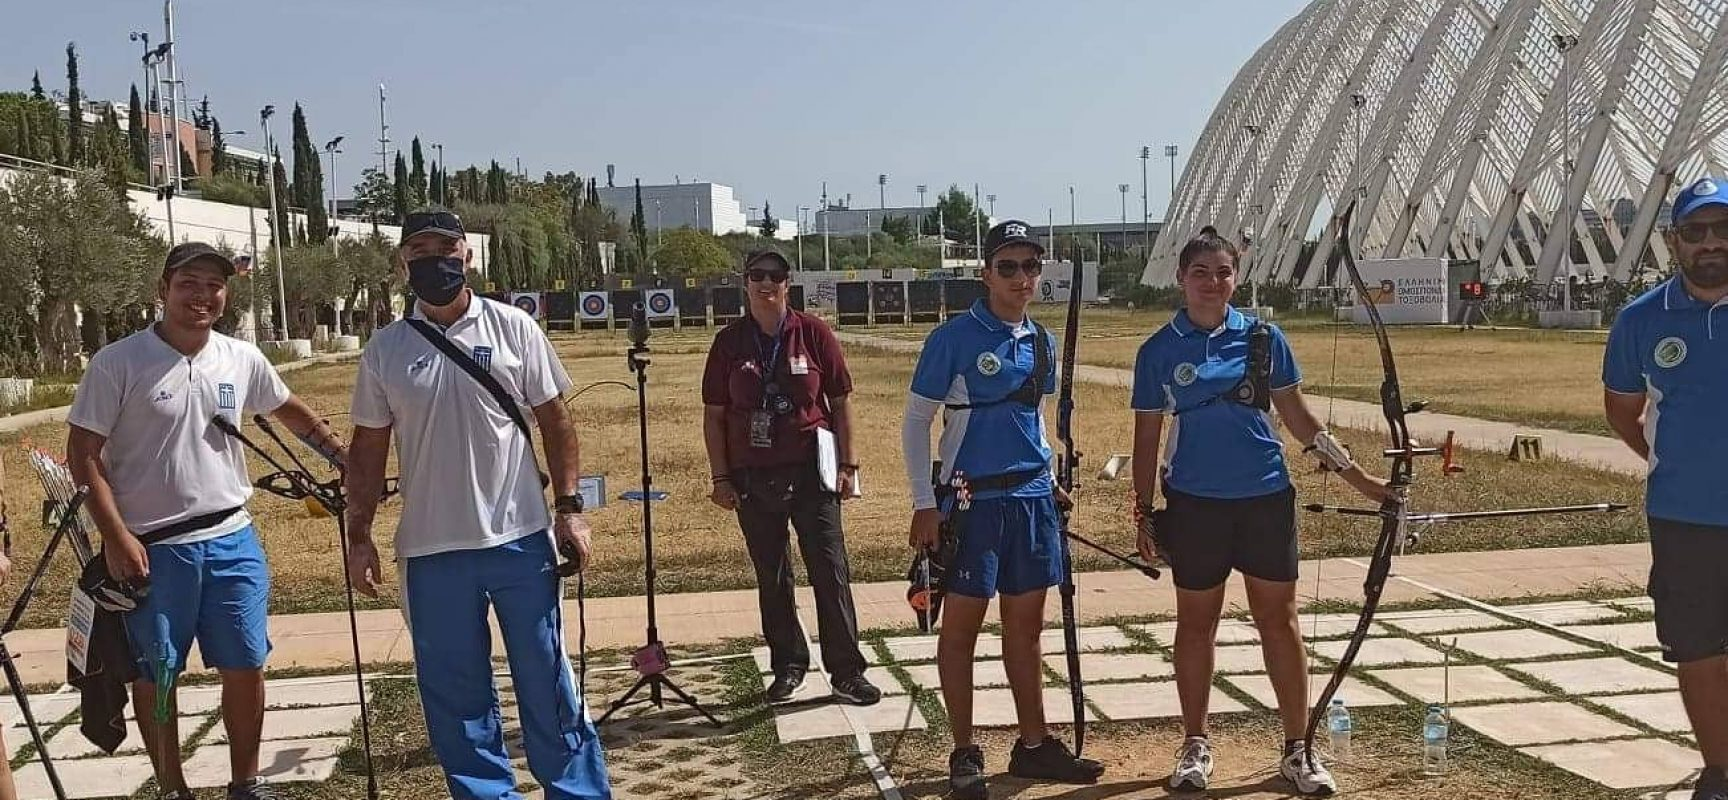 H Eθνική ομάδα για τον αγώνα στην Κύπρο